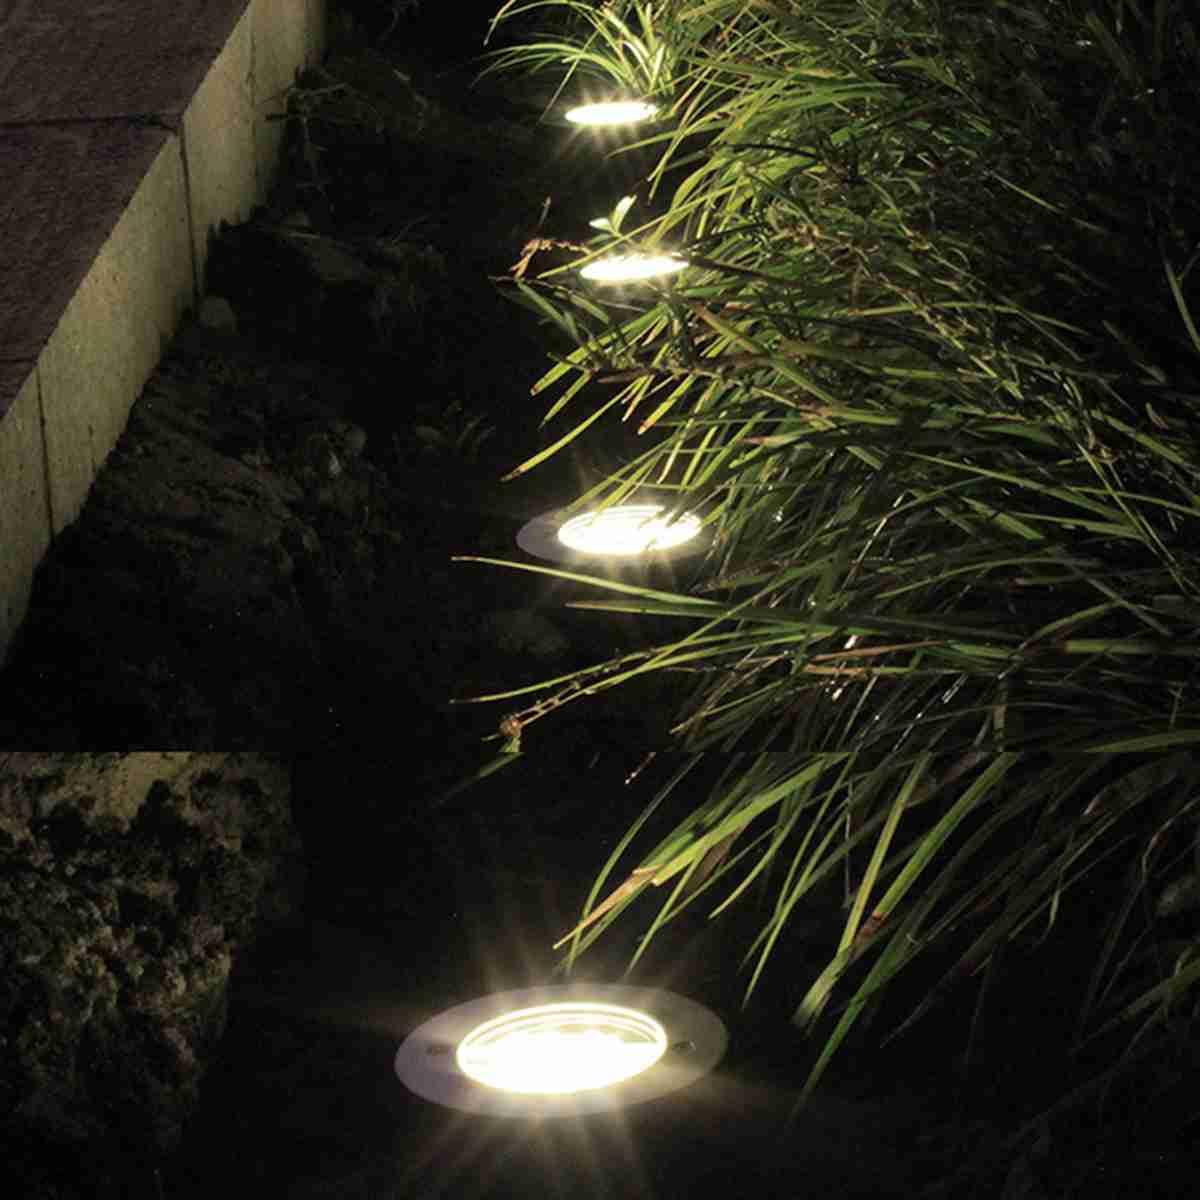 Luces solares para iluminar los espacios exteriores 29